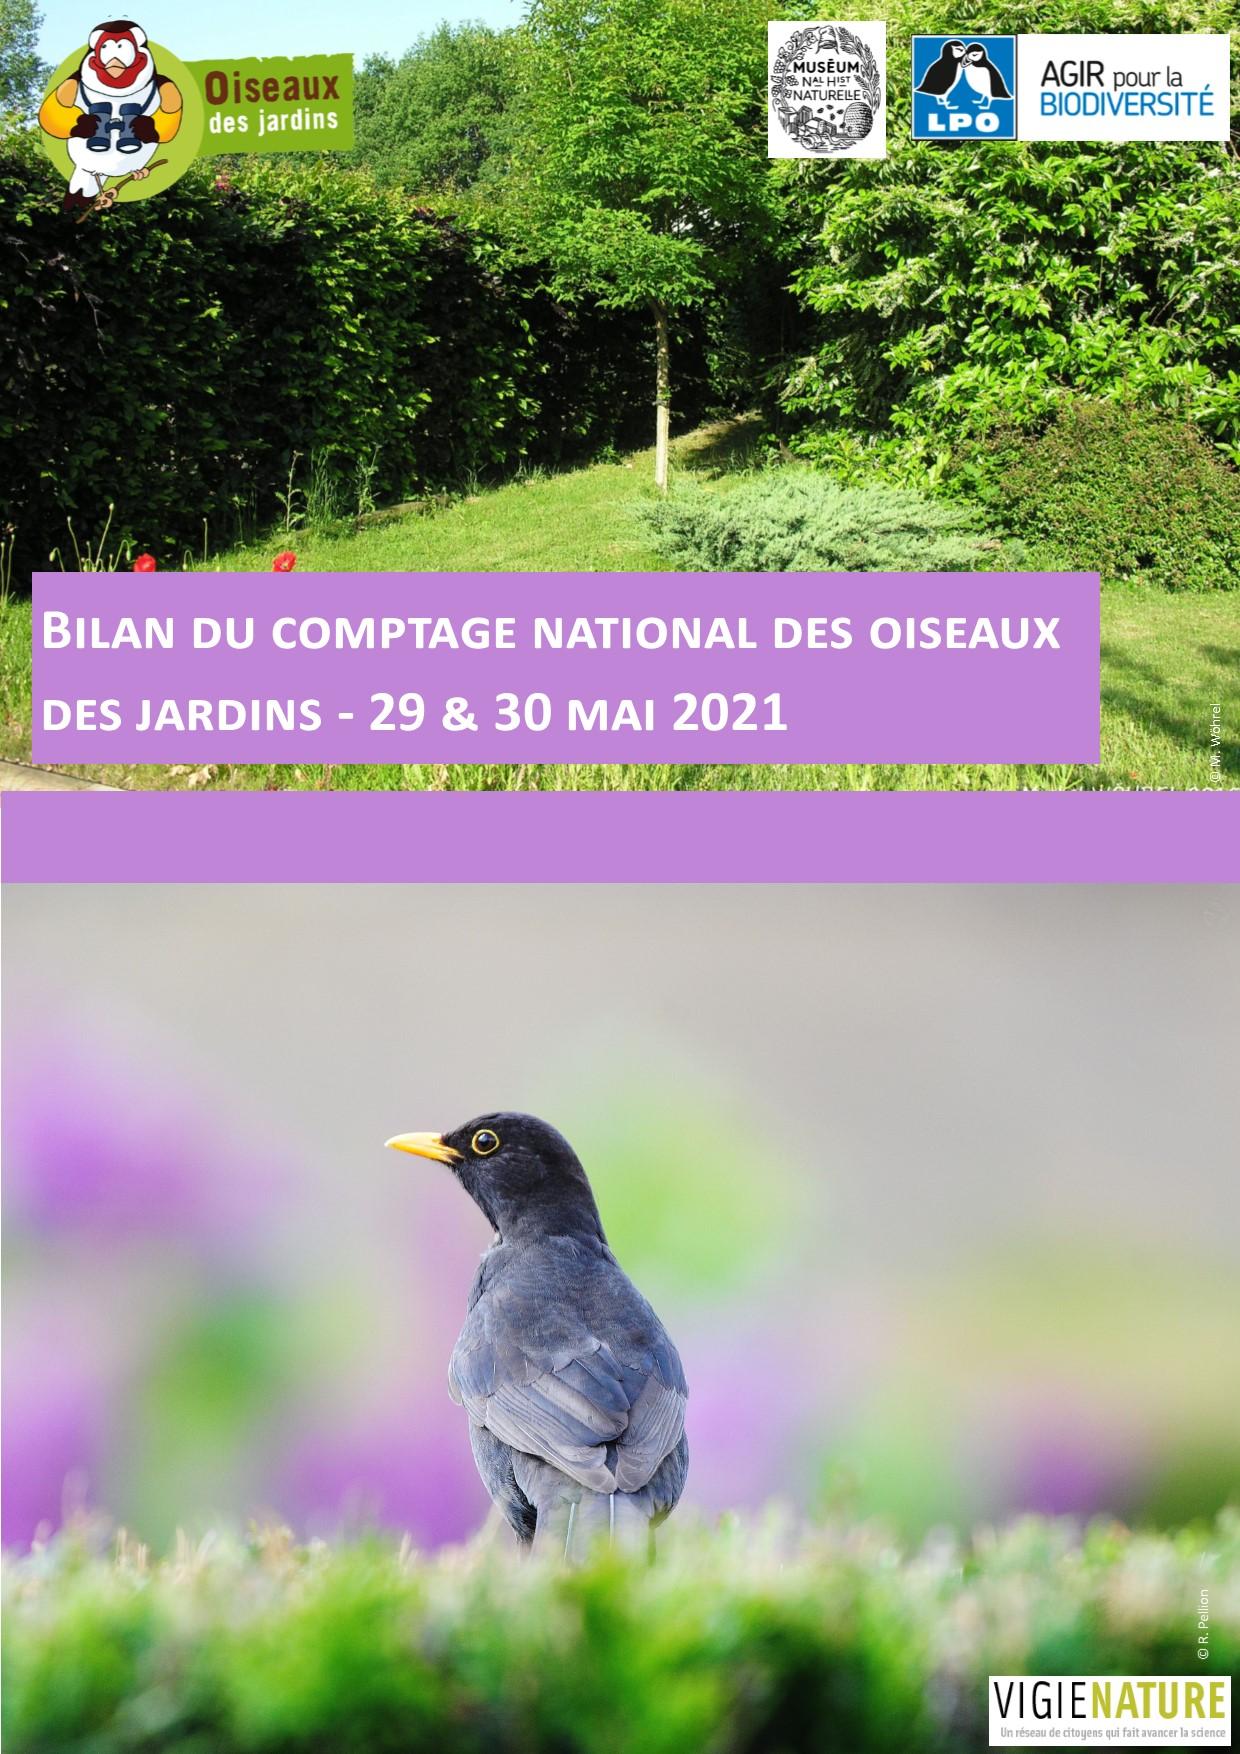 https://cdnfiles1.biolovision.net/www.oiseauxdesjardins.fr/userfiles/Bilancomptageodjmai2021VF_1.jpg